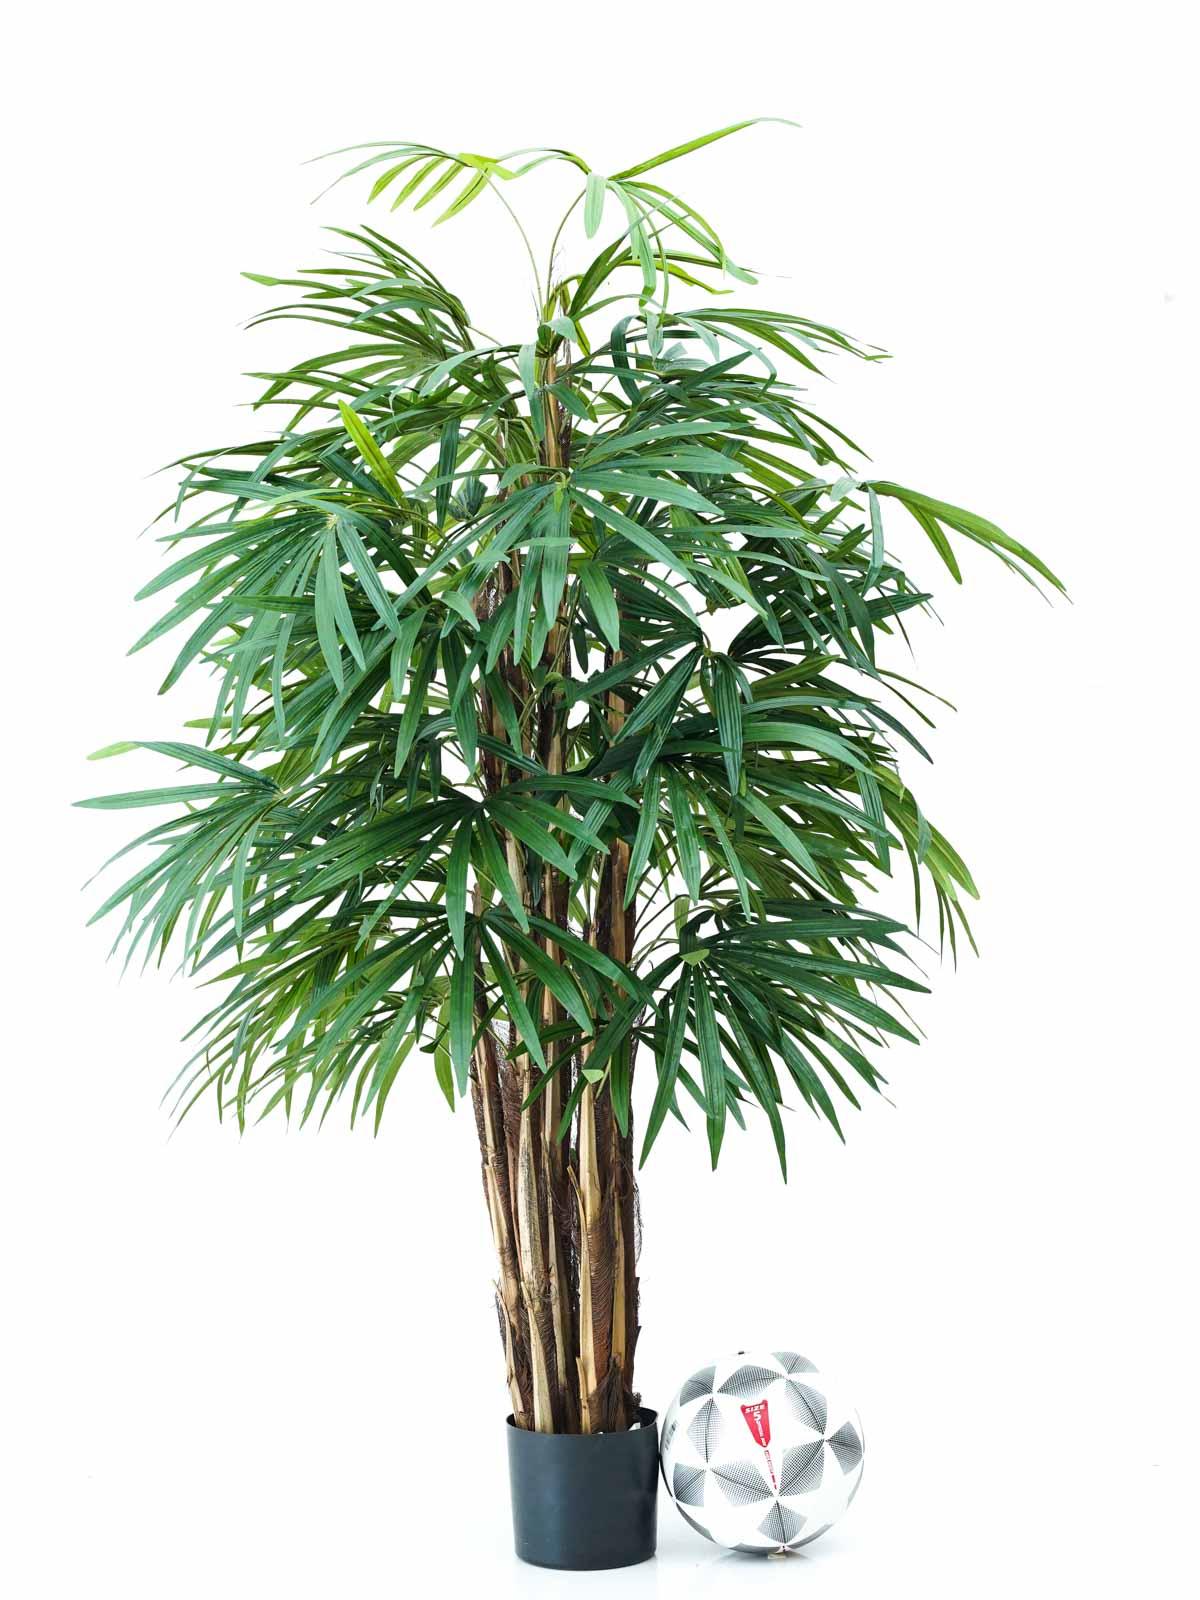 Bamboo - Buddha Tree Artificial Plants Trees